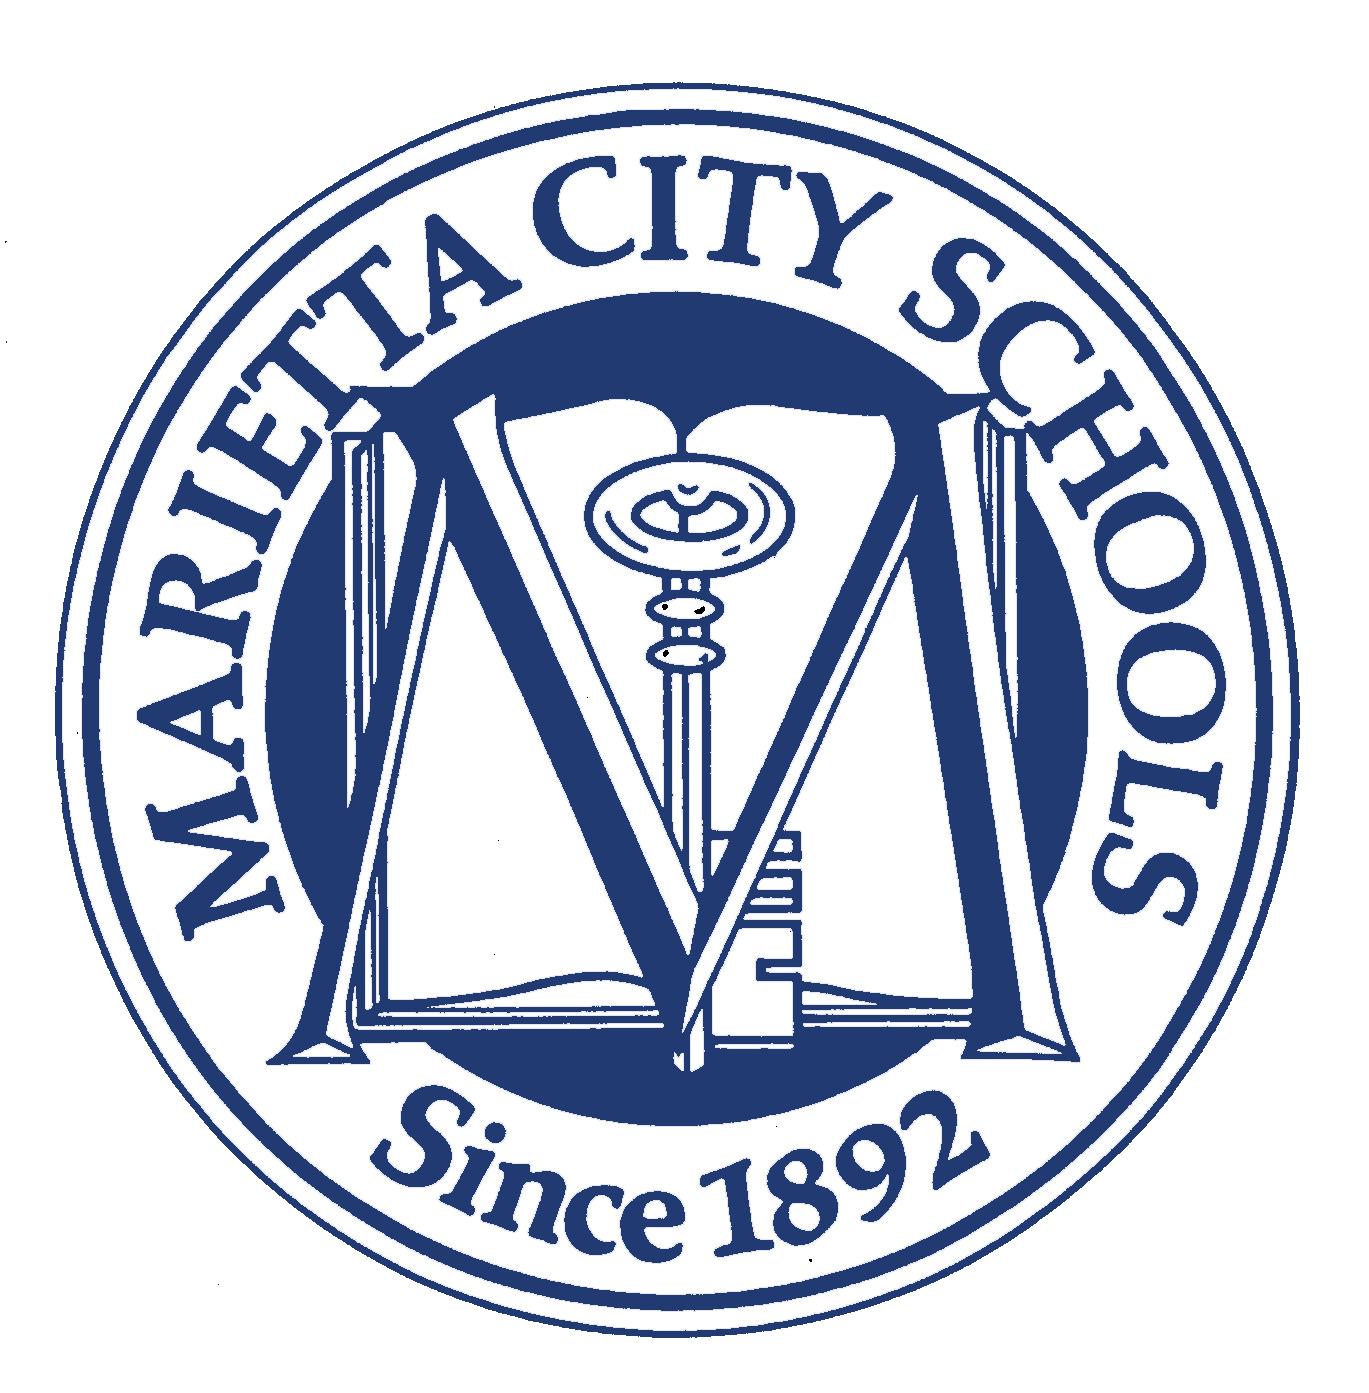 Marietta City Schools logo